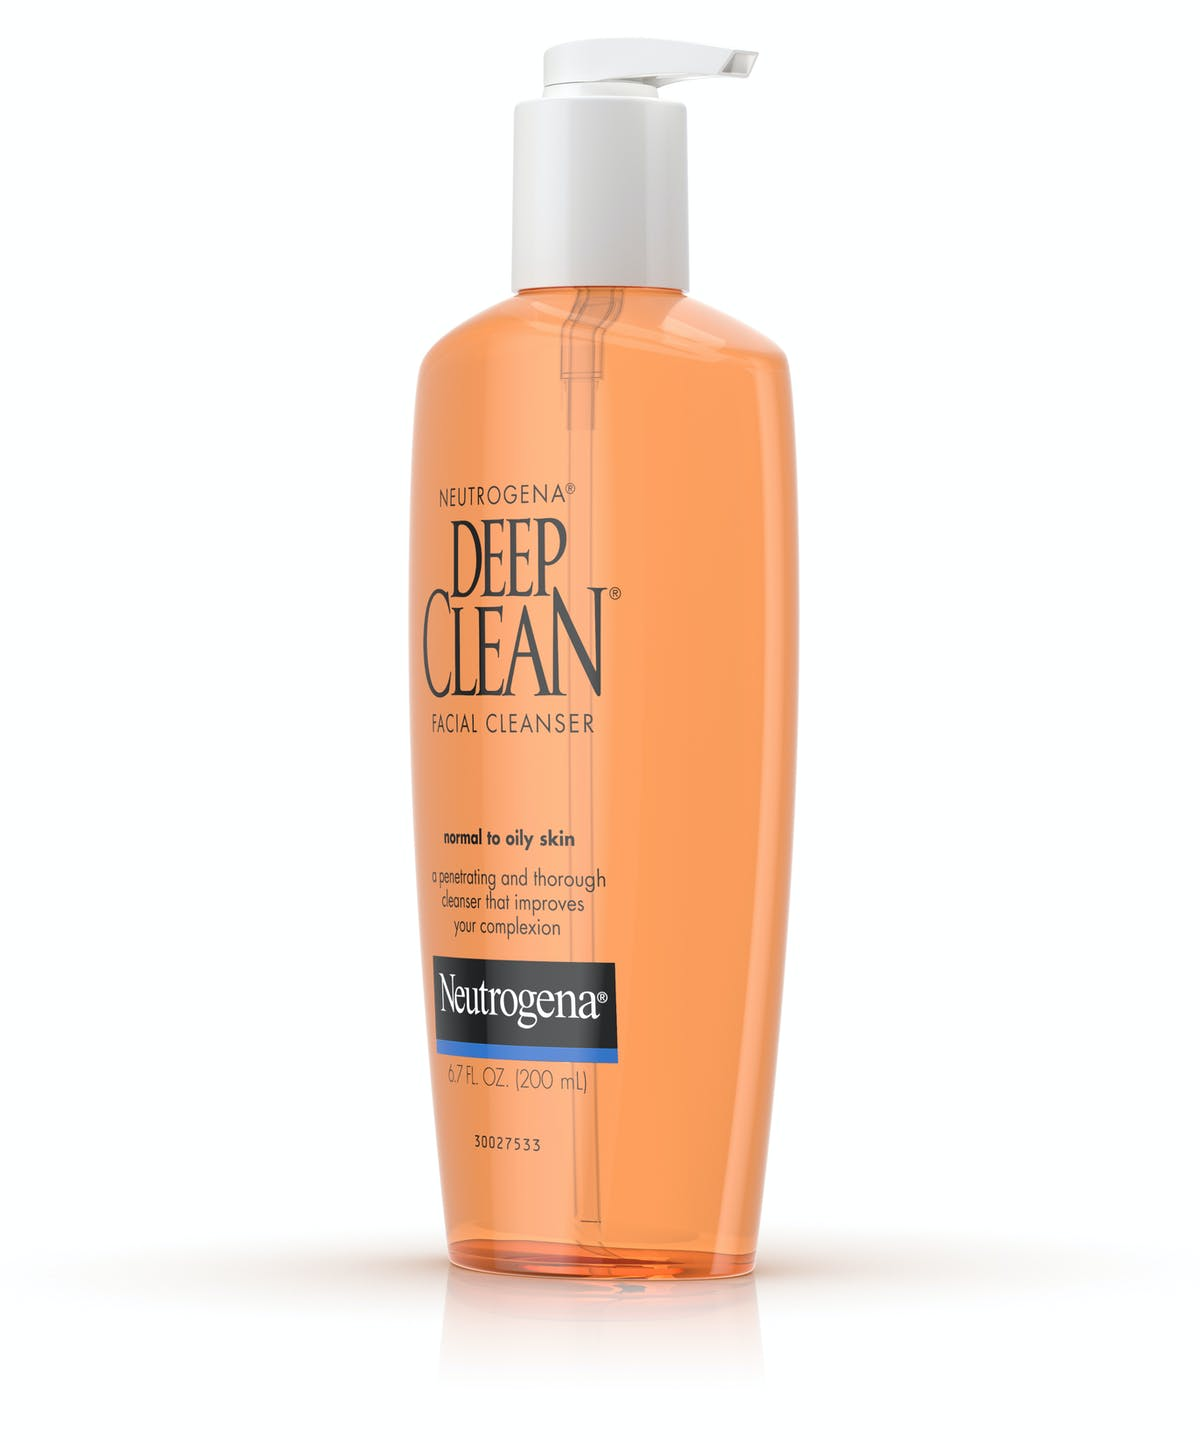 neutrogena deep clean face wash